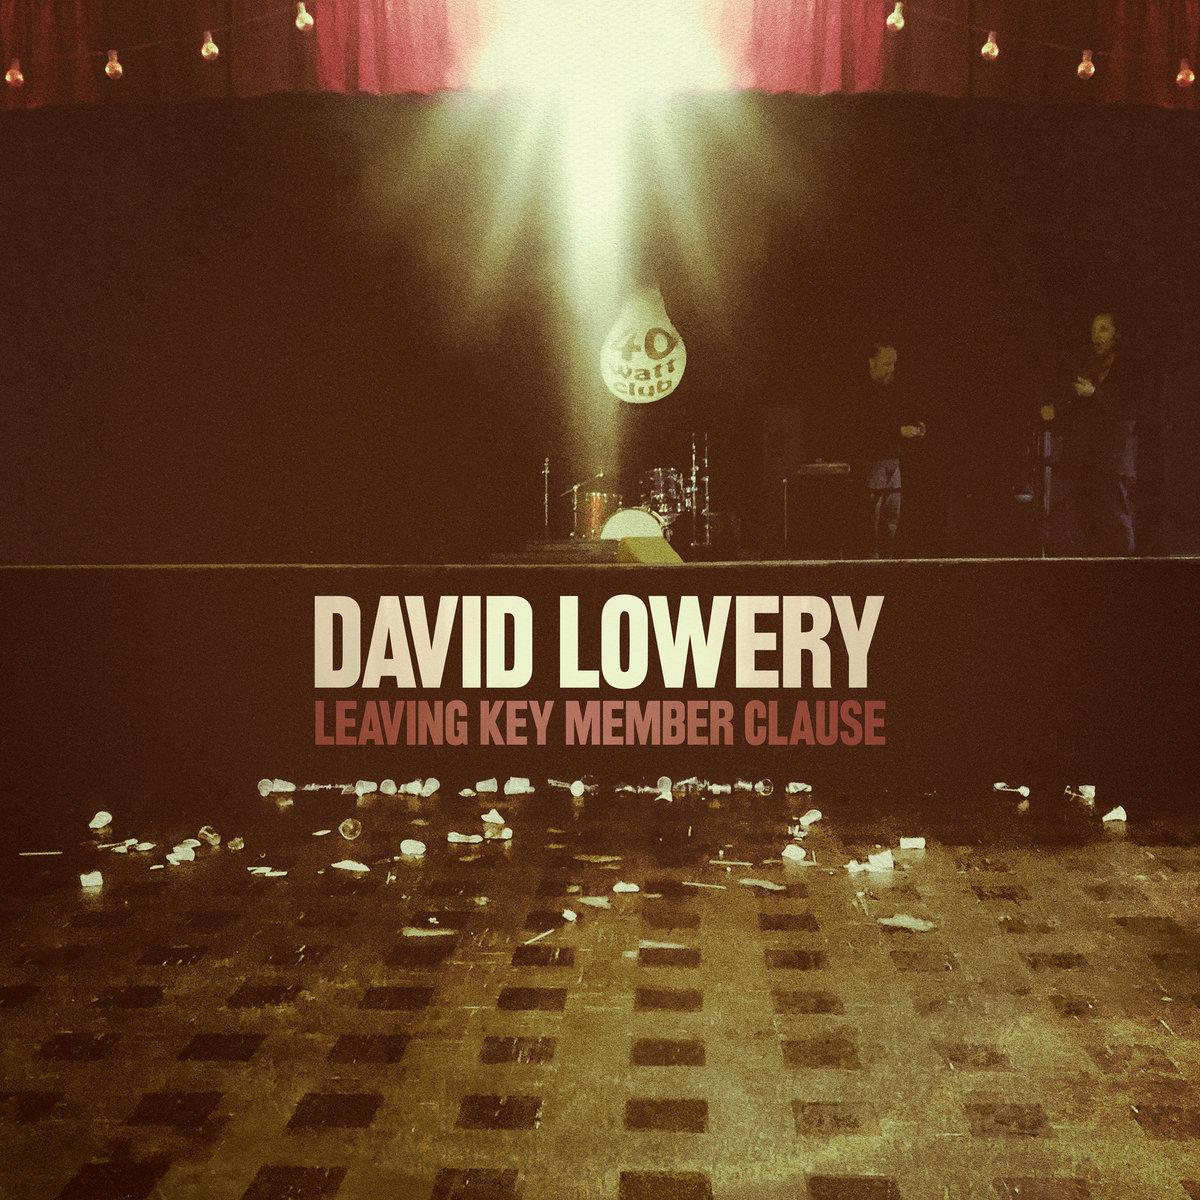 Leaving Key Member Clause - David Lowery